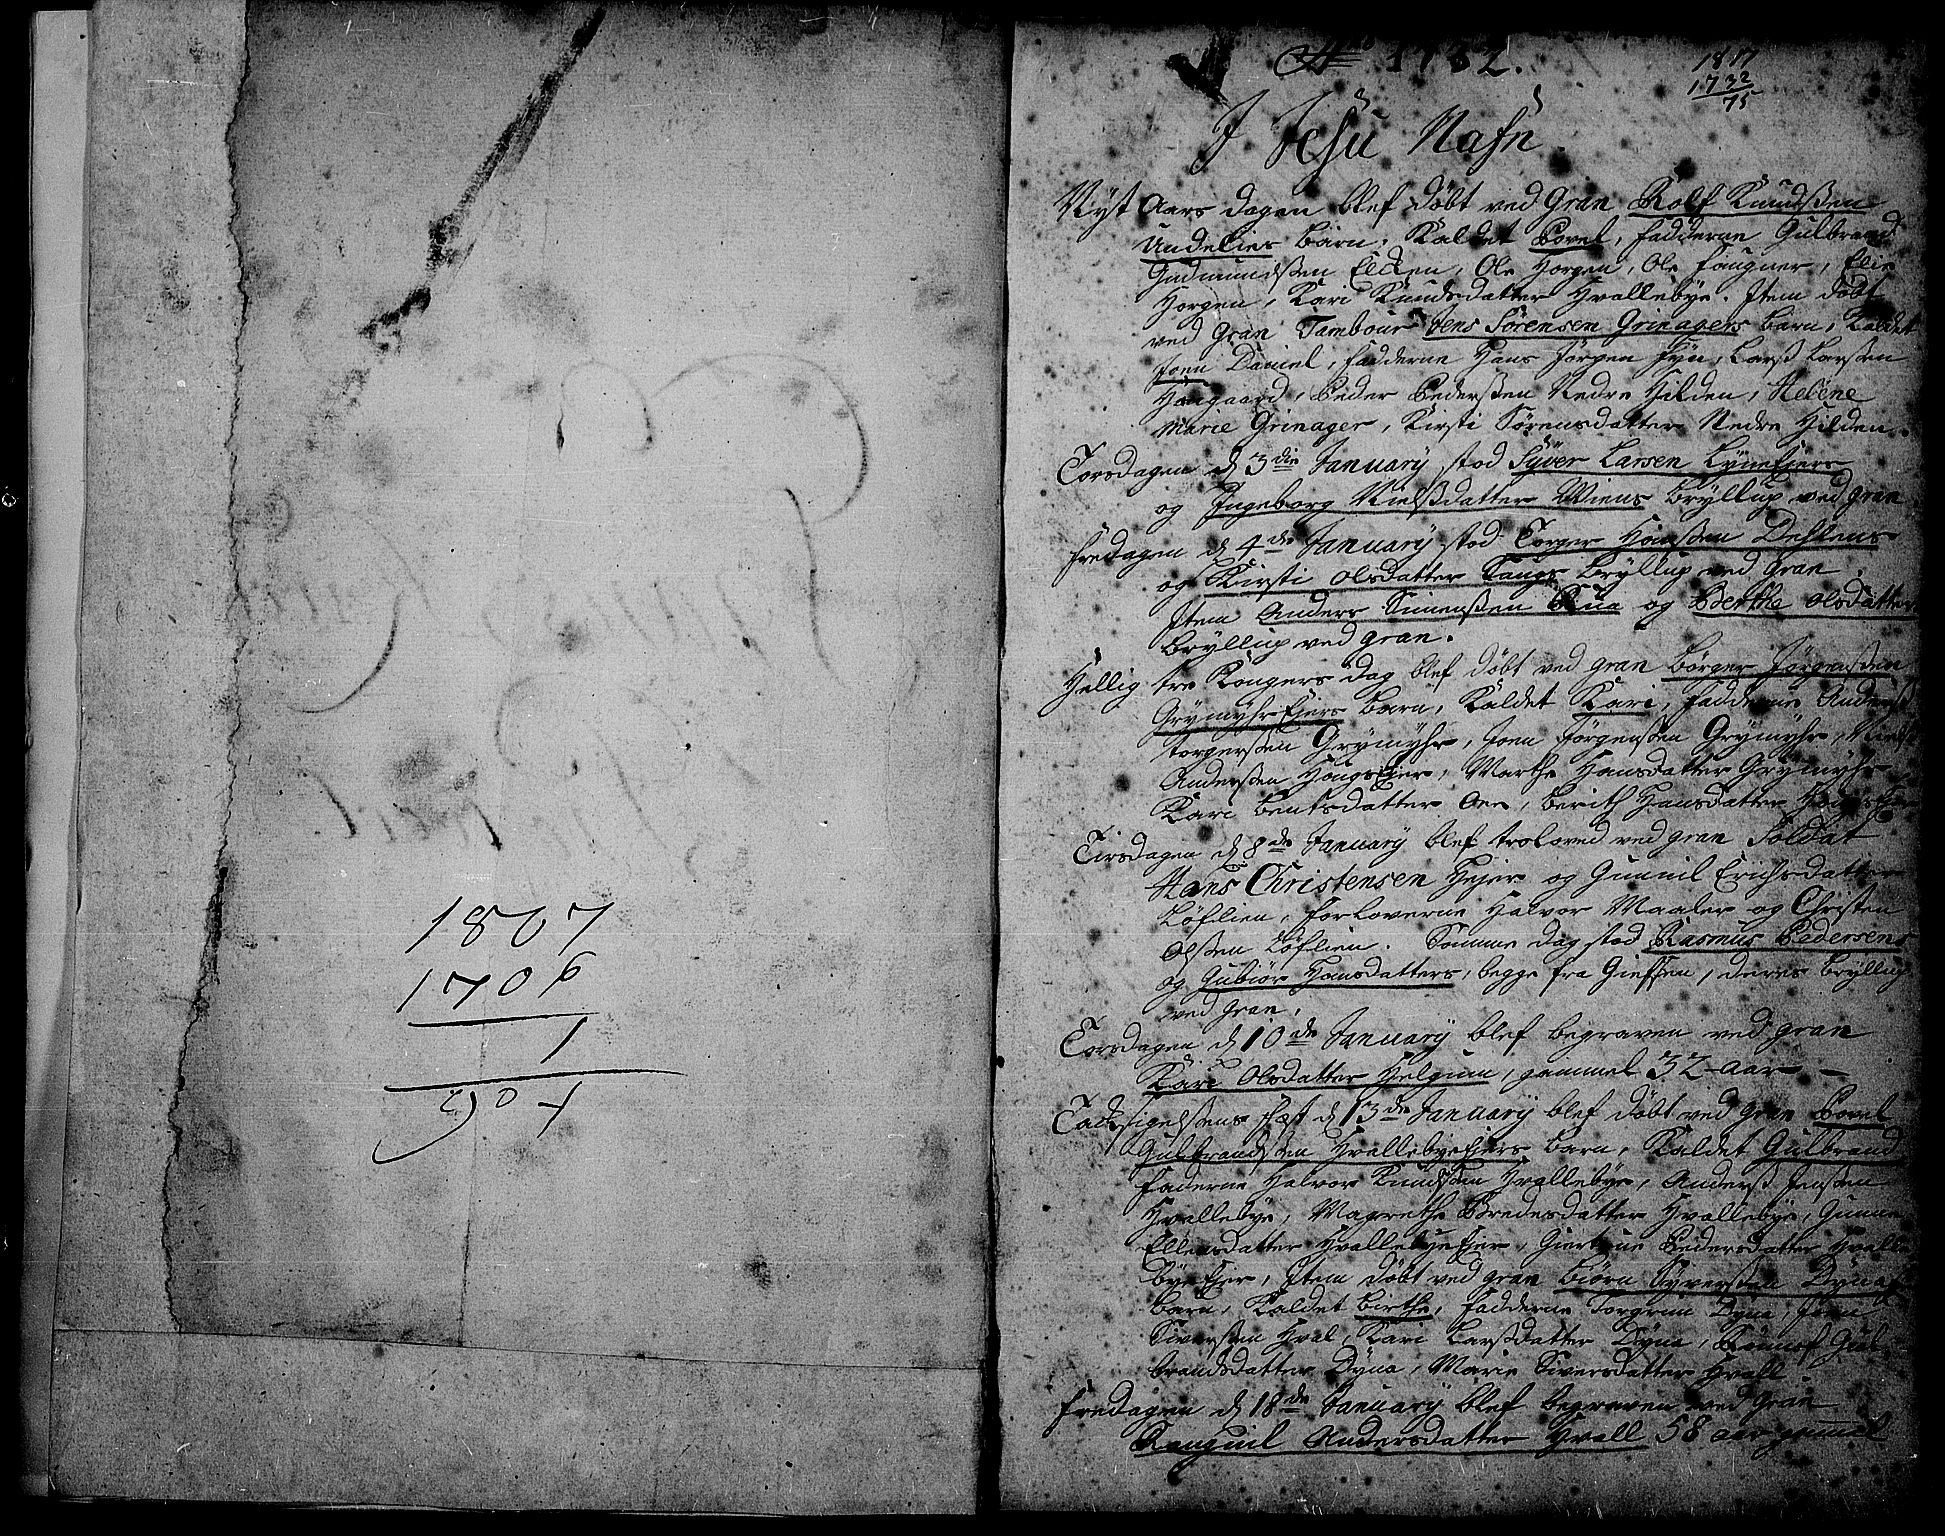 SAH, Gran prestekontor, Parish register (official) no. 2, 1732-1744, p. 1